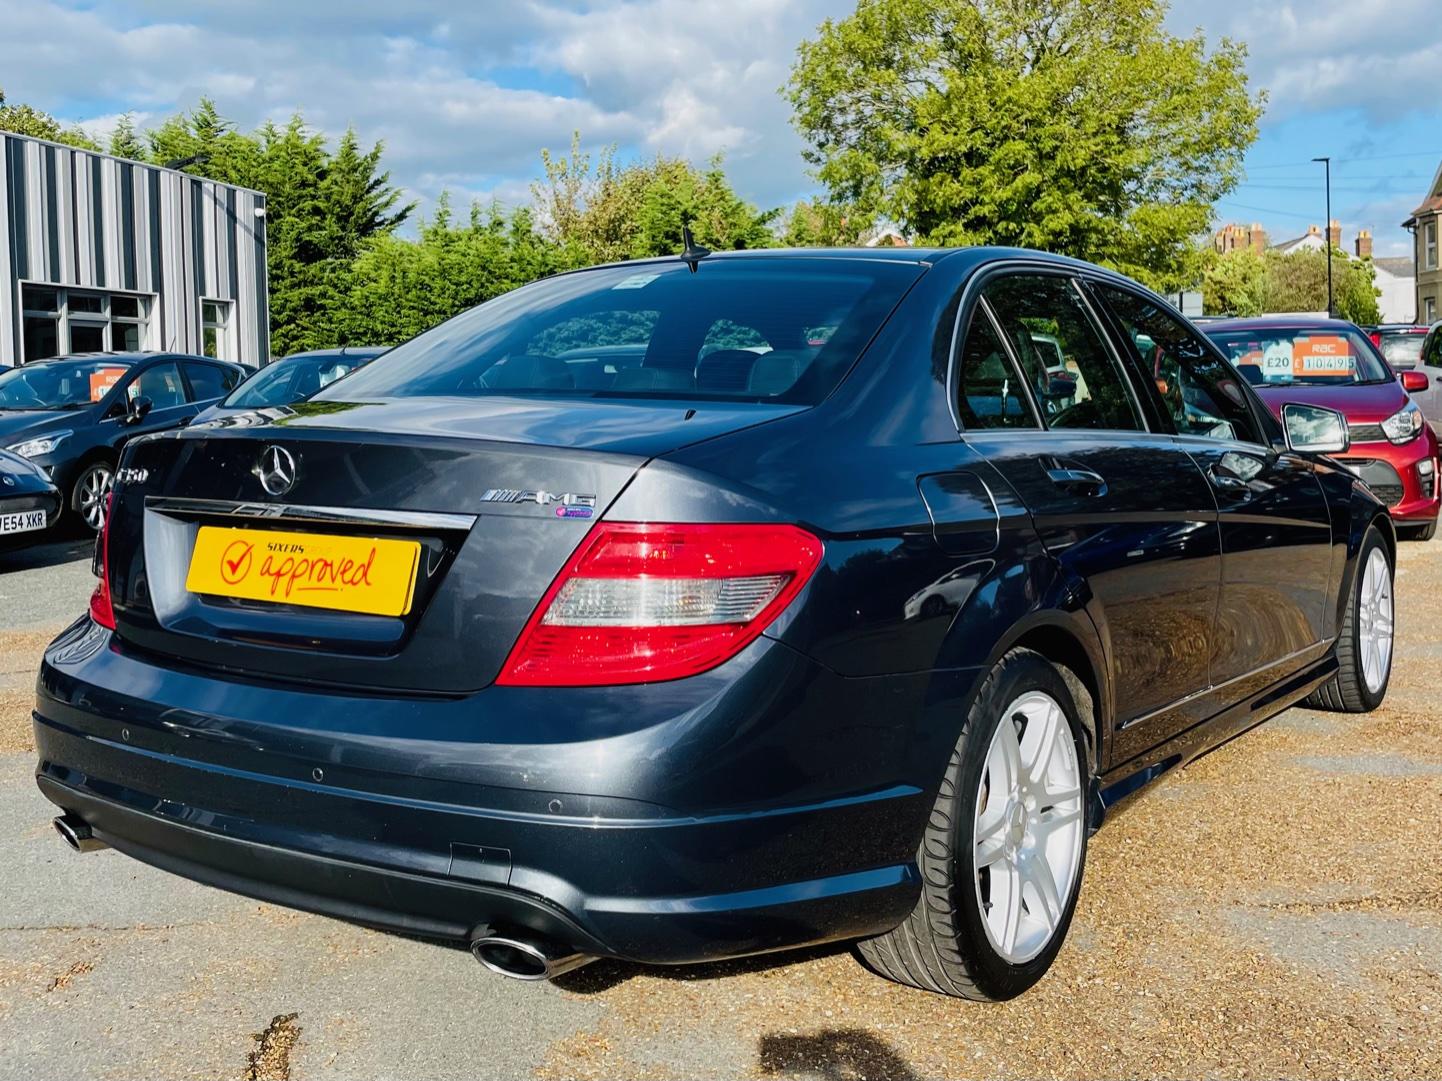 Car For Sale Mercedes C-Class - KP58ZHH Sixers Group Image #3